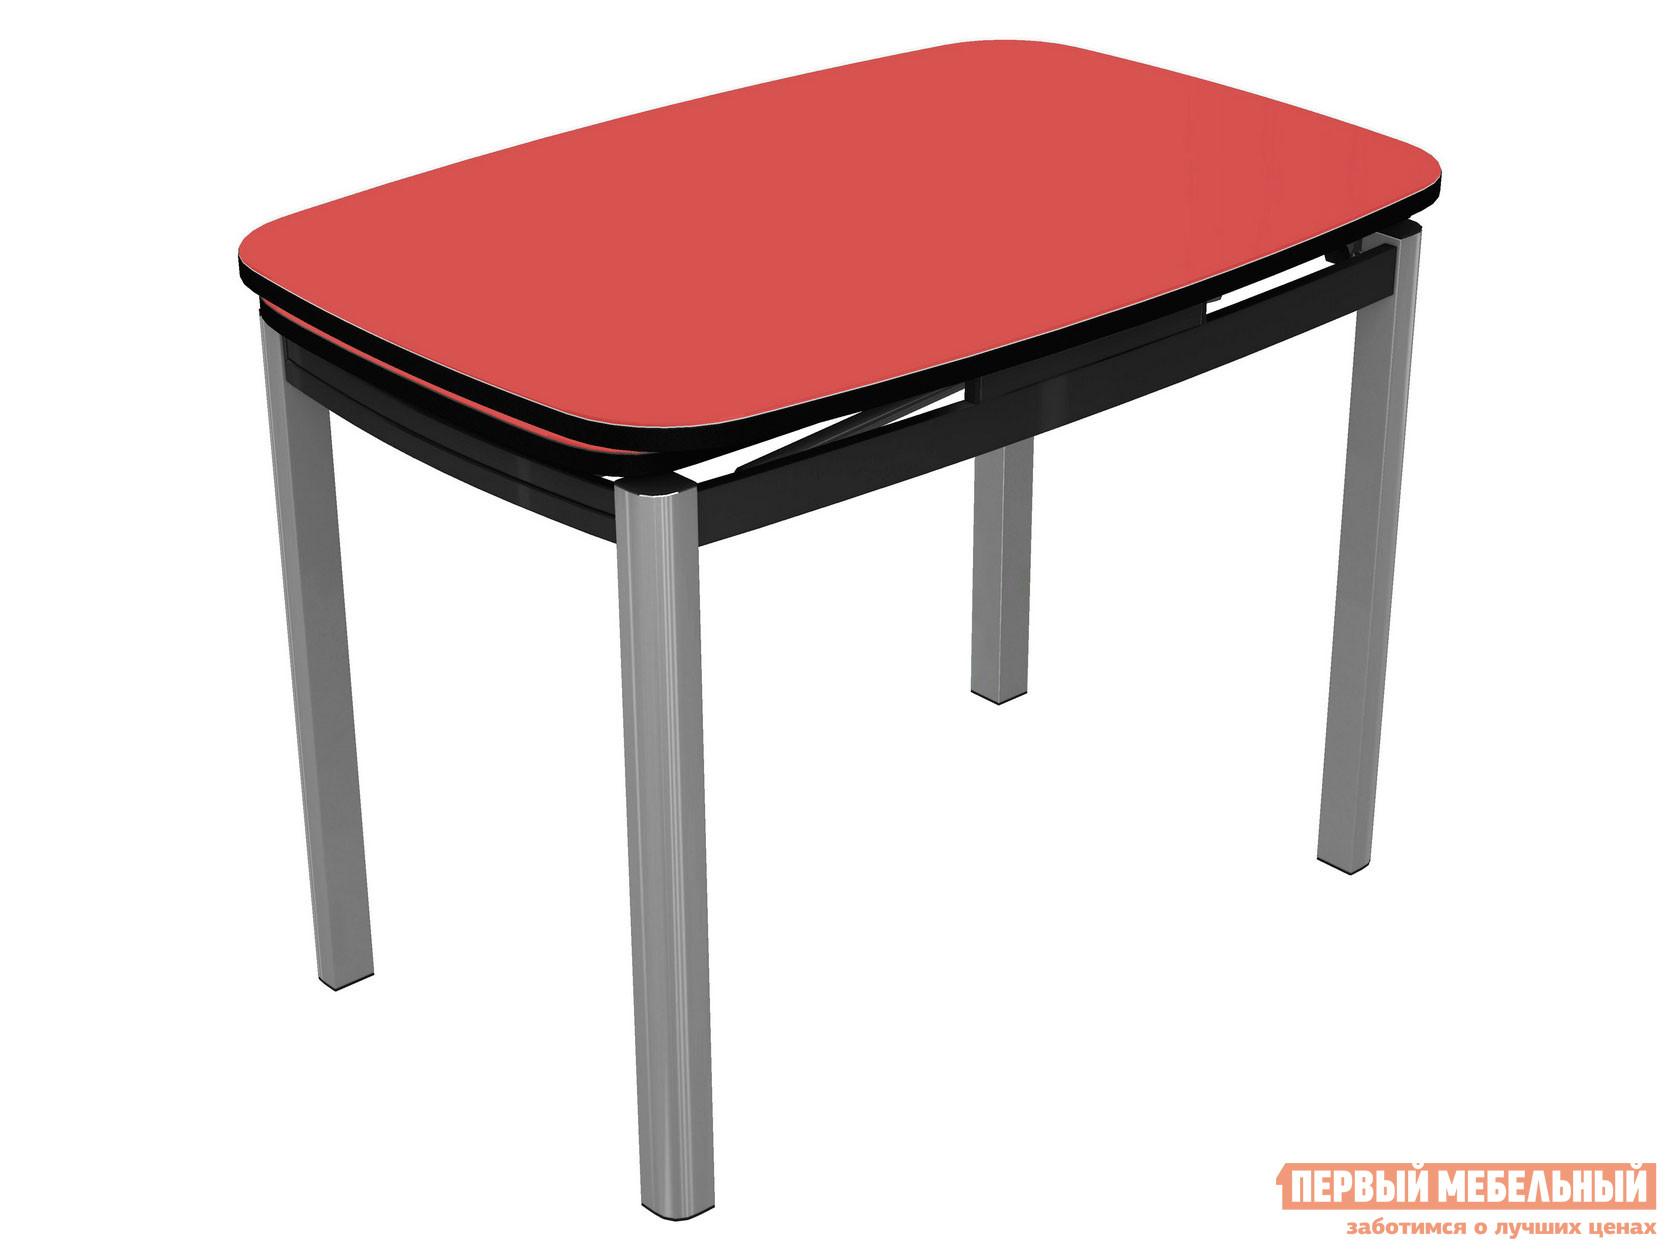 Кухонный стол Линоторг Харбин - Стекло